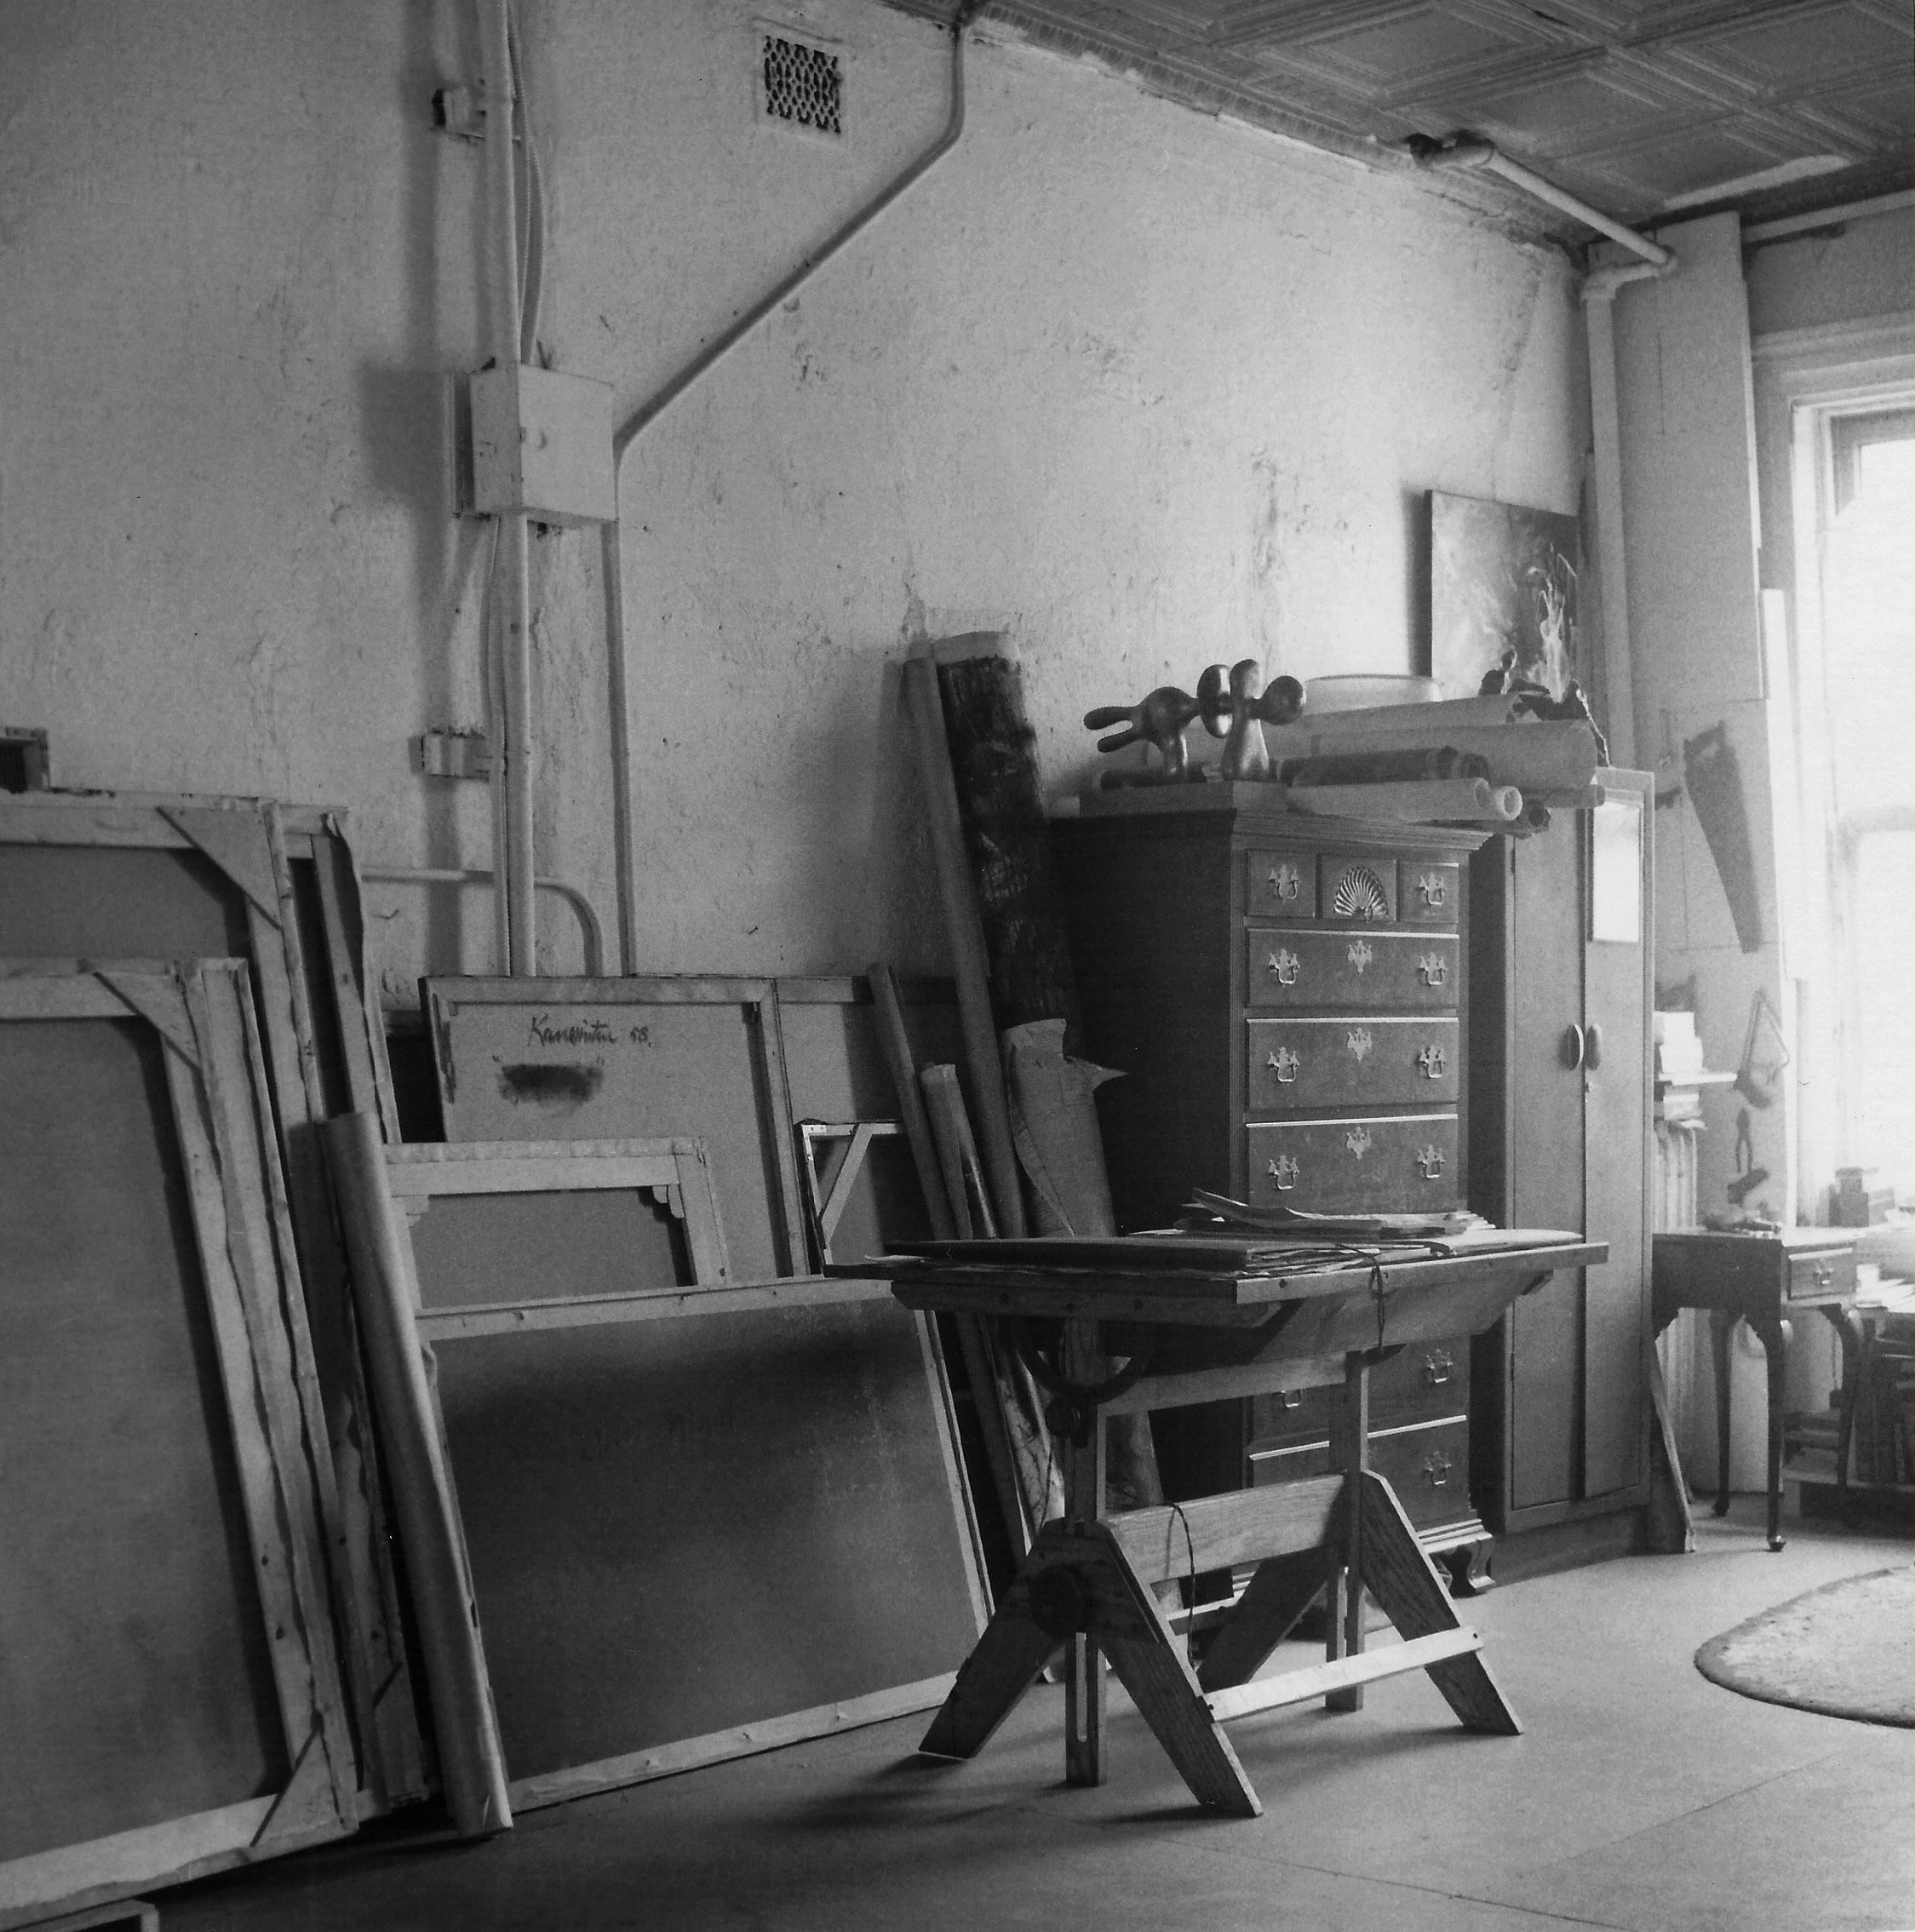 Kanemitsu's New York studio at 158 West 22nd Street.